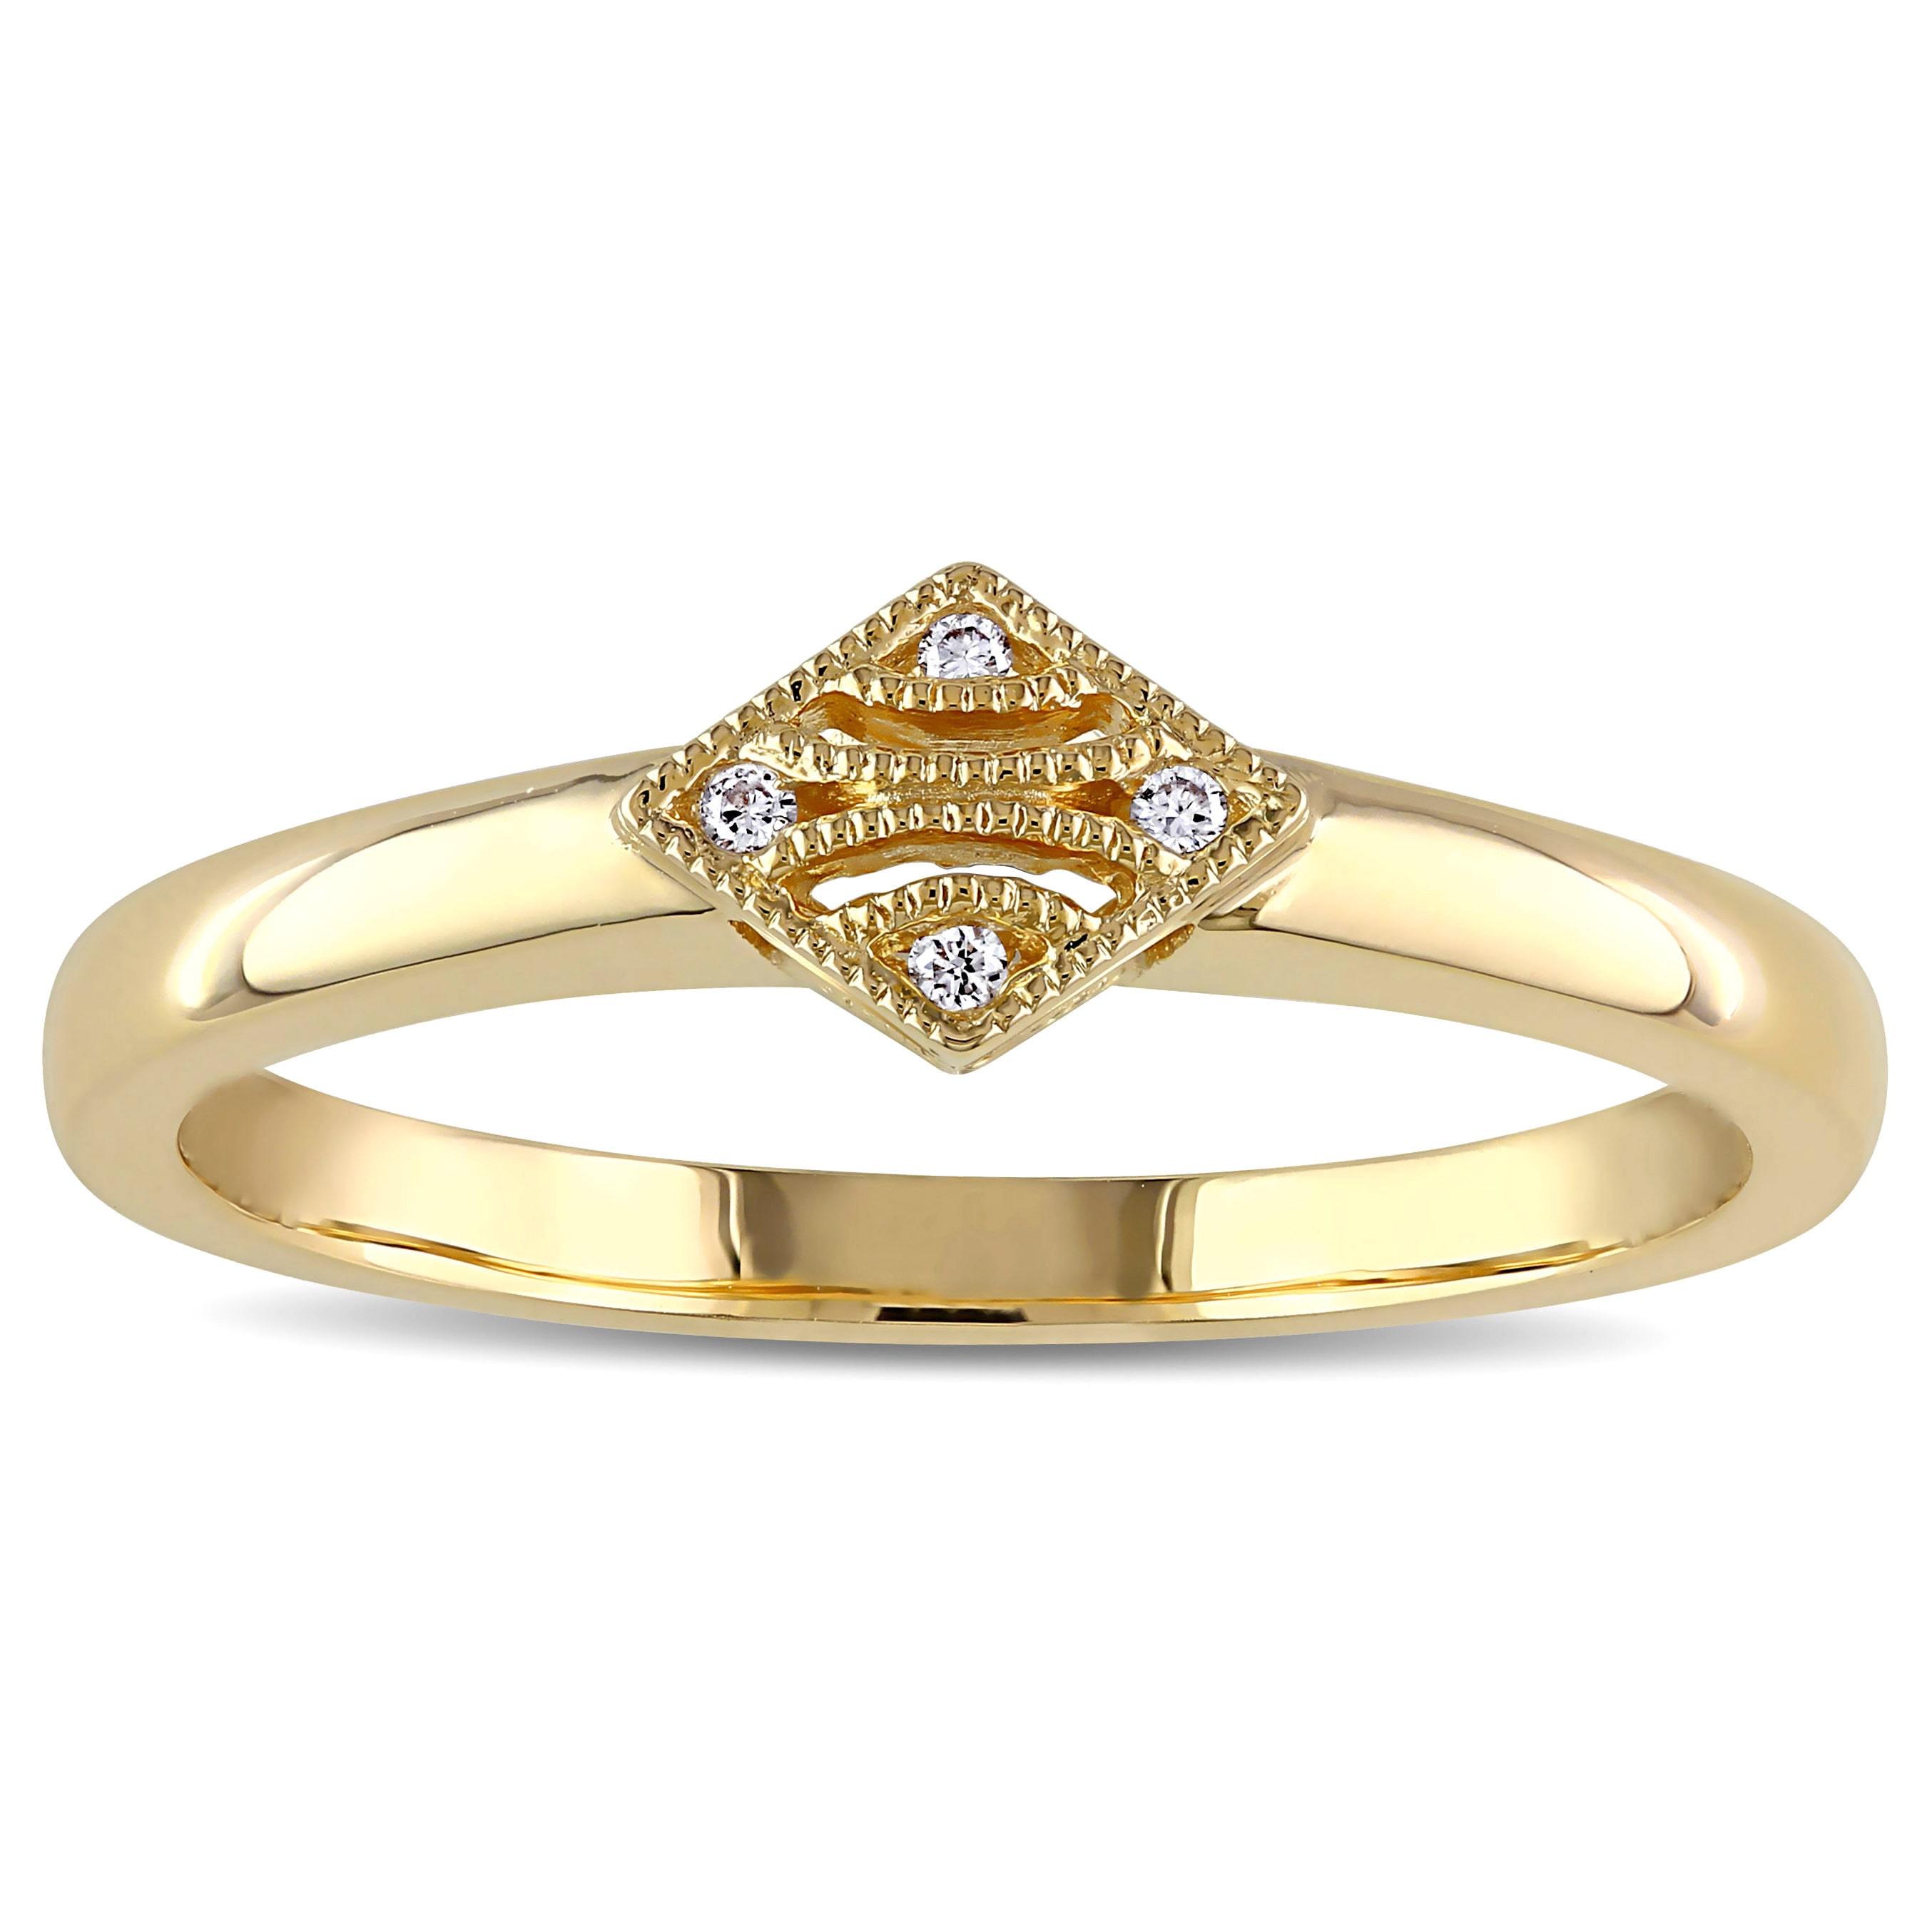 V1969 Italia  Diamond Accent Tapestry Ring in 14k Yellow Gold